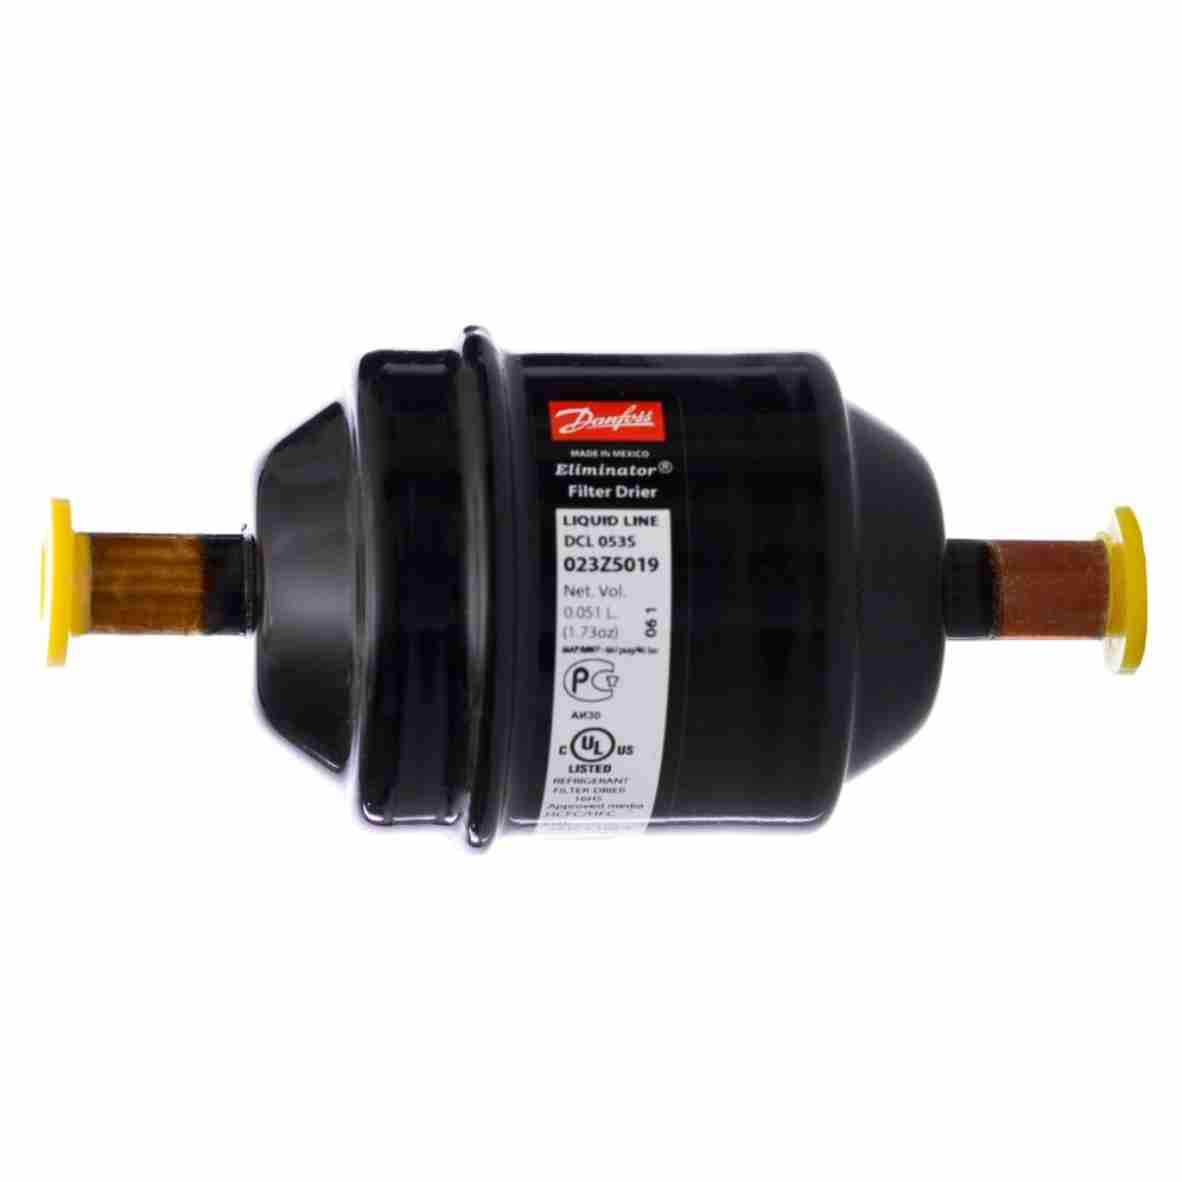 Secador Danfoss DML 053 3/8 Solda